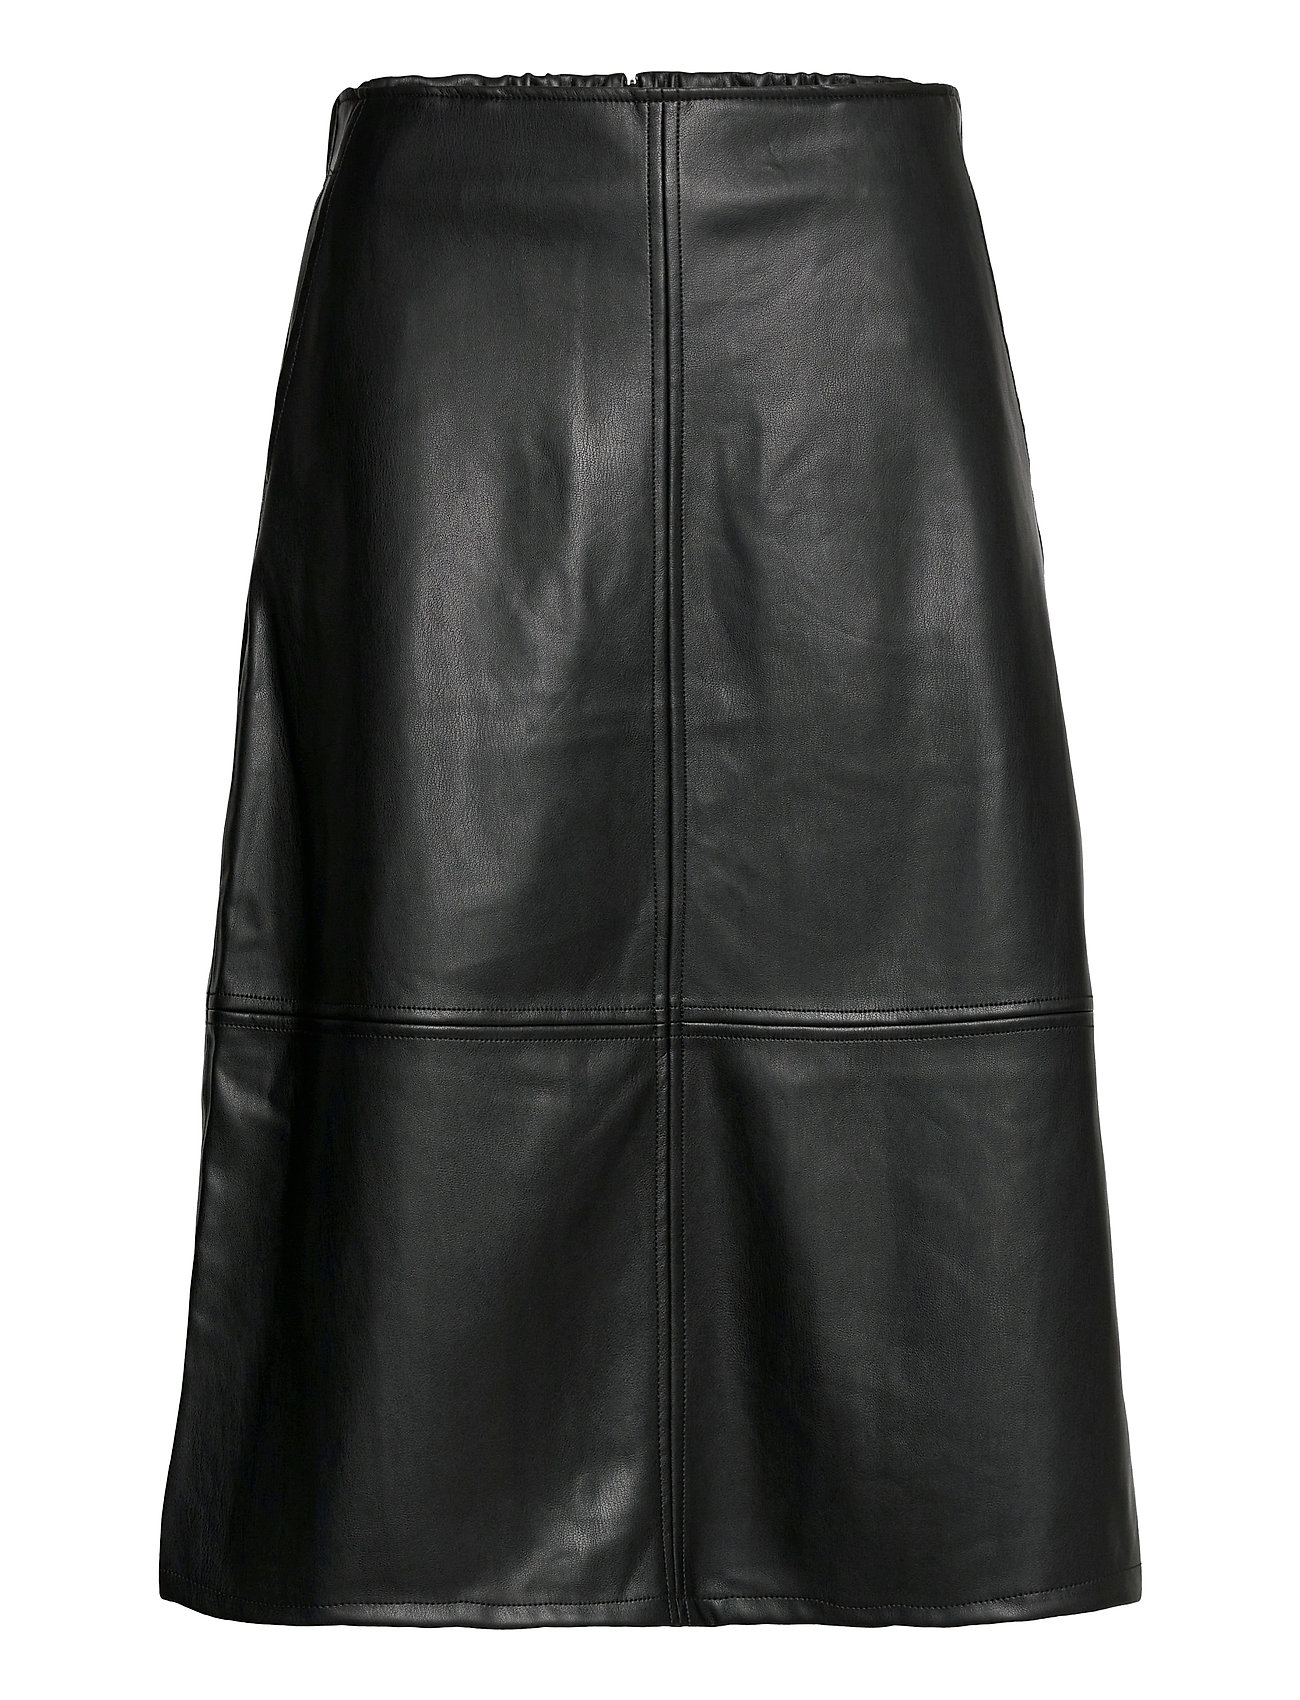 Image of Skirts Woven Knælang Nederdel Sort EDC By Esprit (3483310983)